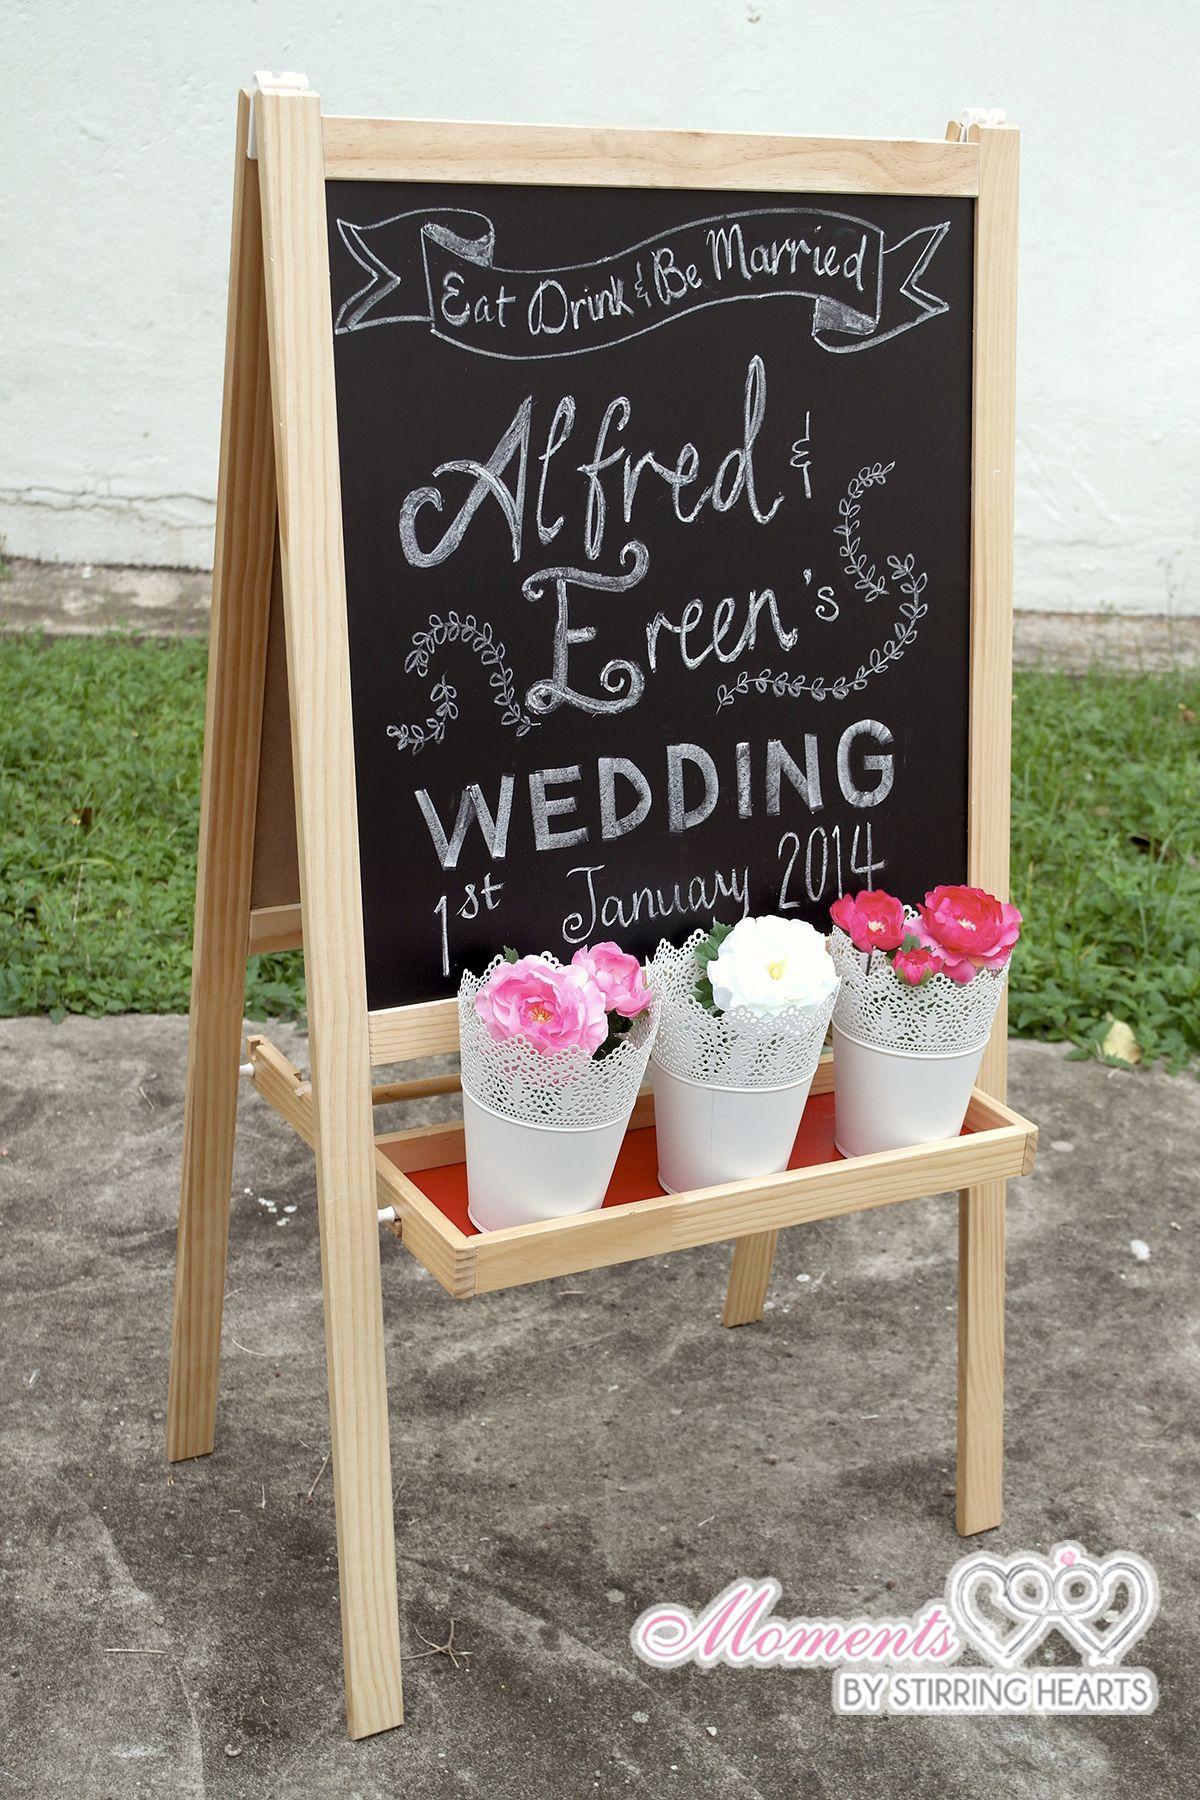 ikea chalkboard wedding welcome sign garden wedding pinterest ikea chalkboard and wedding. Black Bedroom Furniture Sets. Home Design Ideas